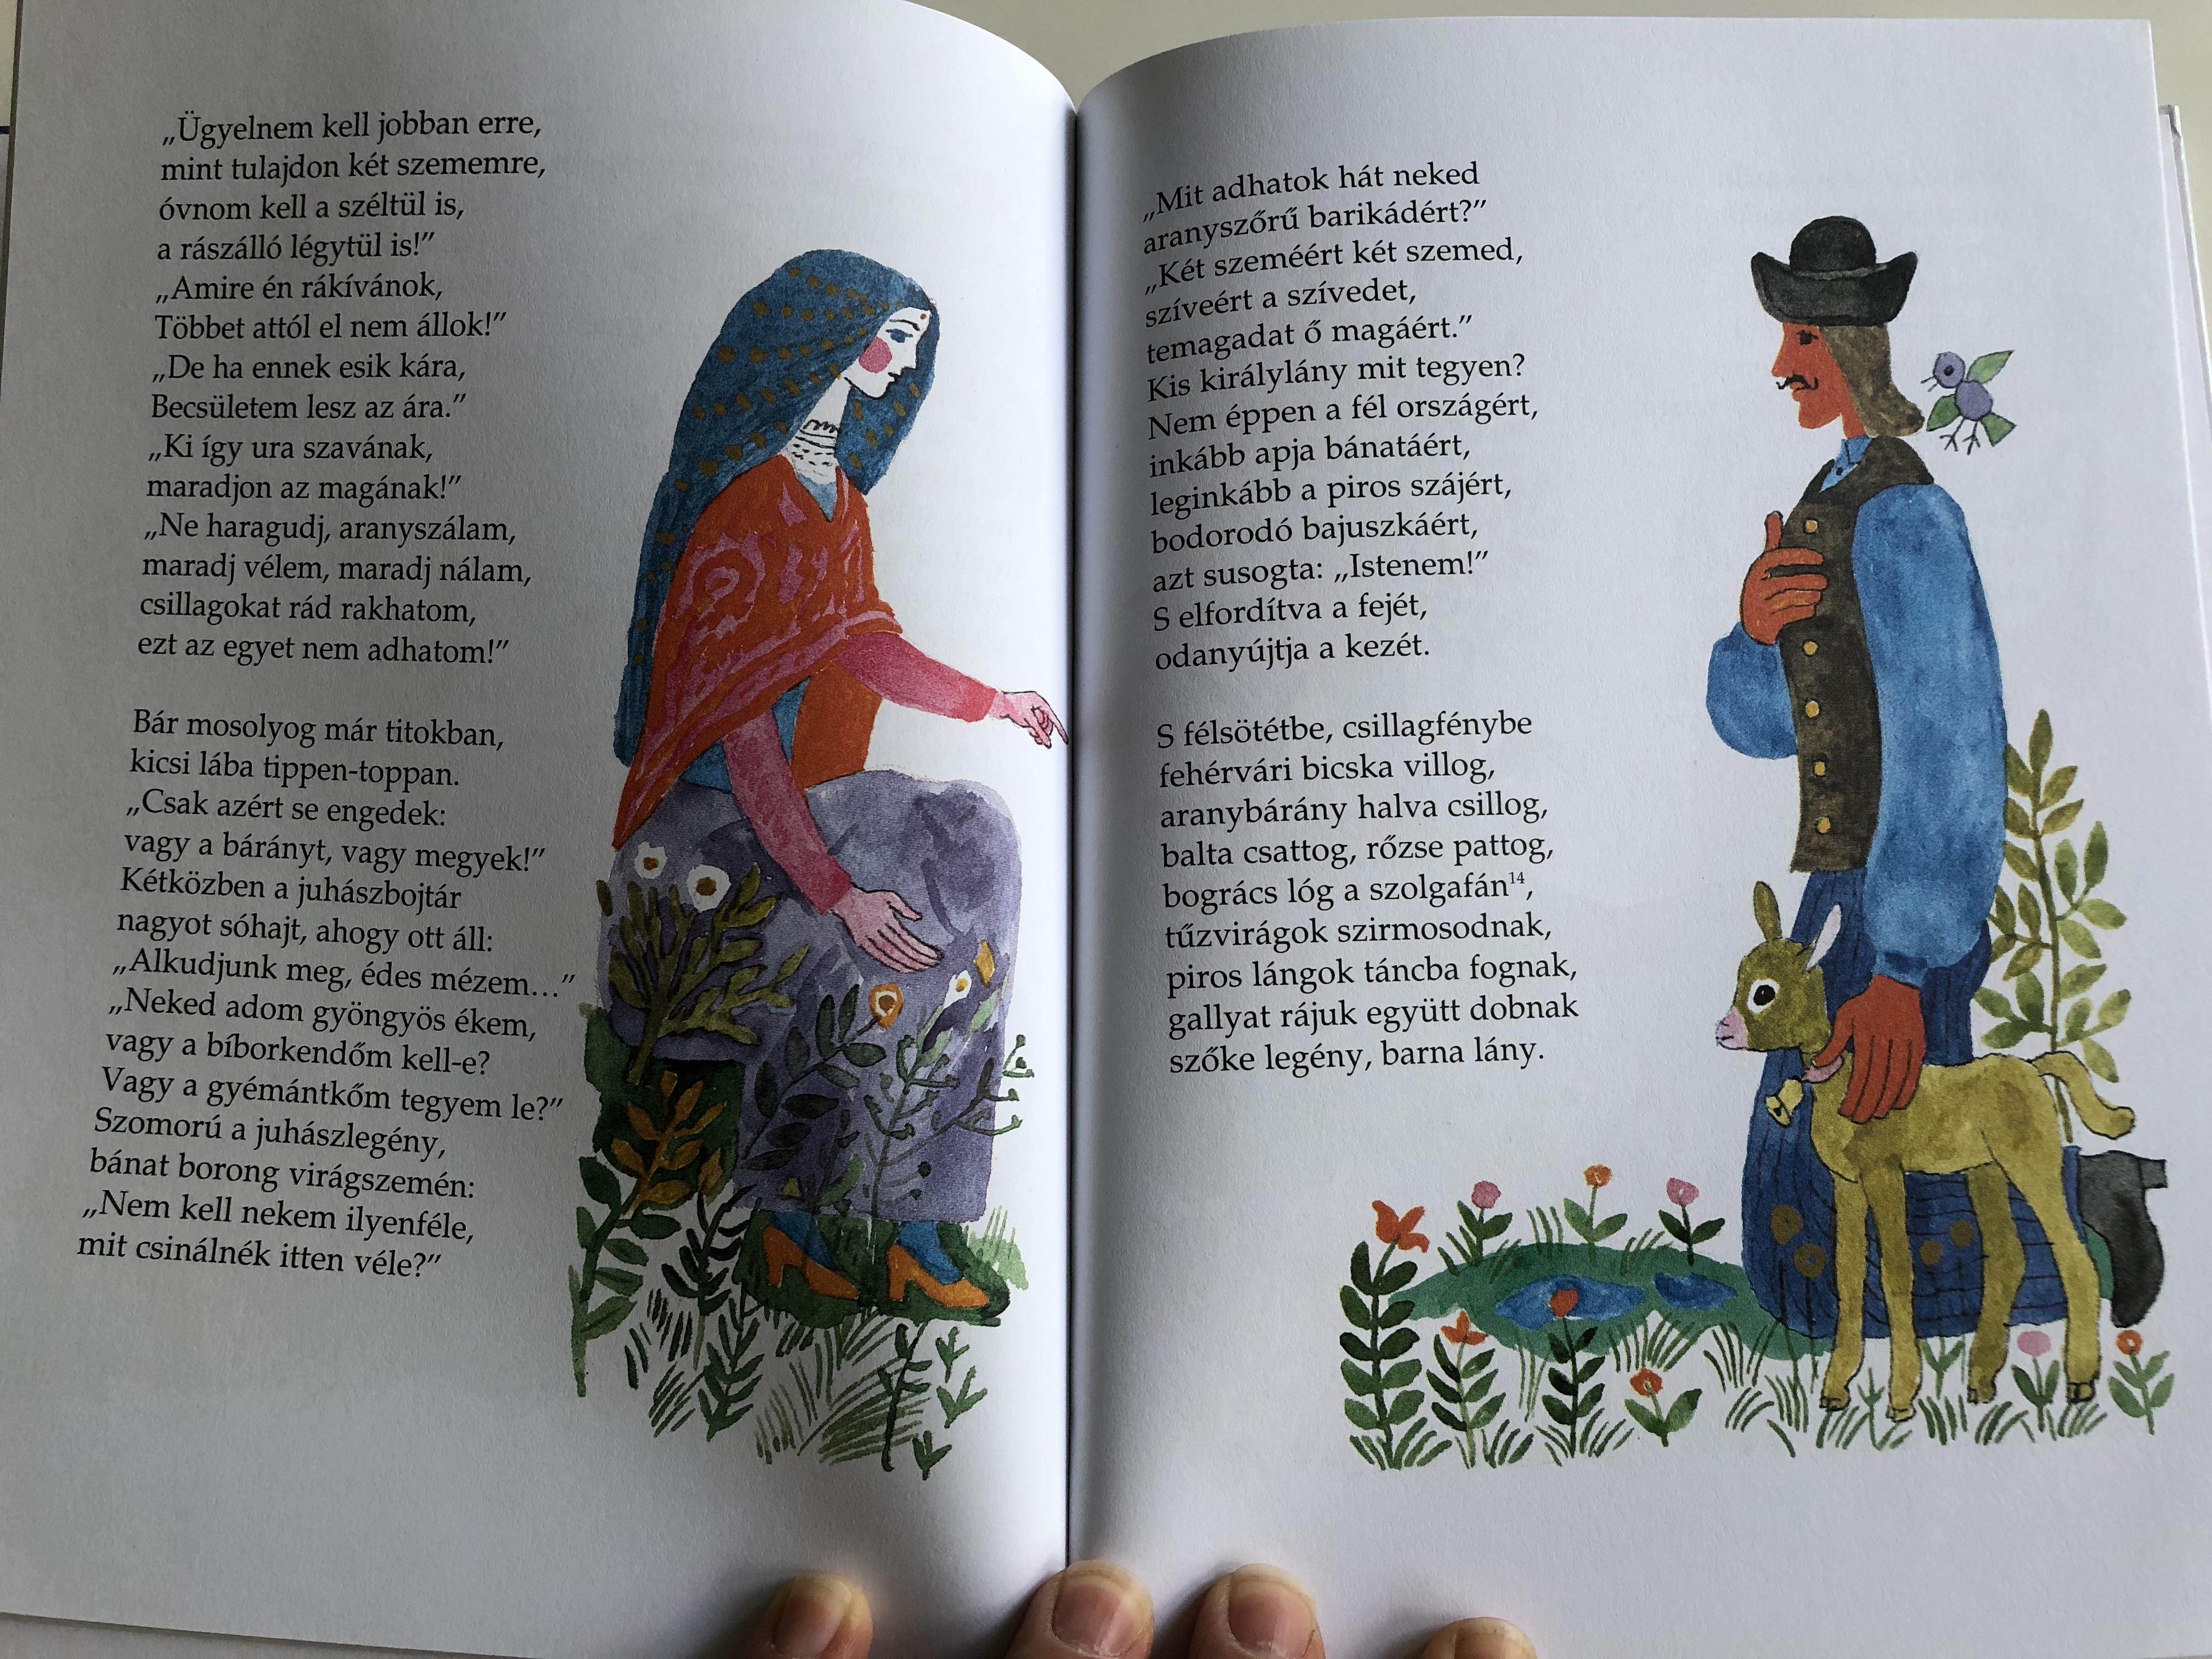 az-aranysz-r-b-r-ny-by-m-ra-ferenc-hungarian-folk-tale-reich-k-roly-rajzaival-5th-edition-m-ra-k-nyvkiad-2010-4-.jpg